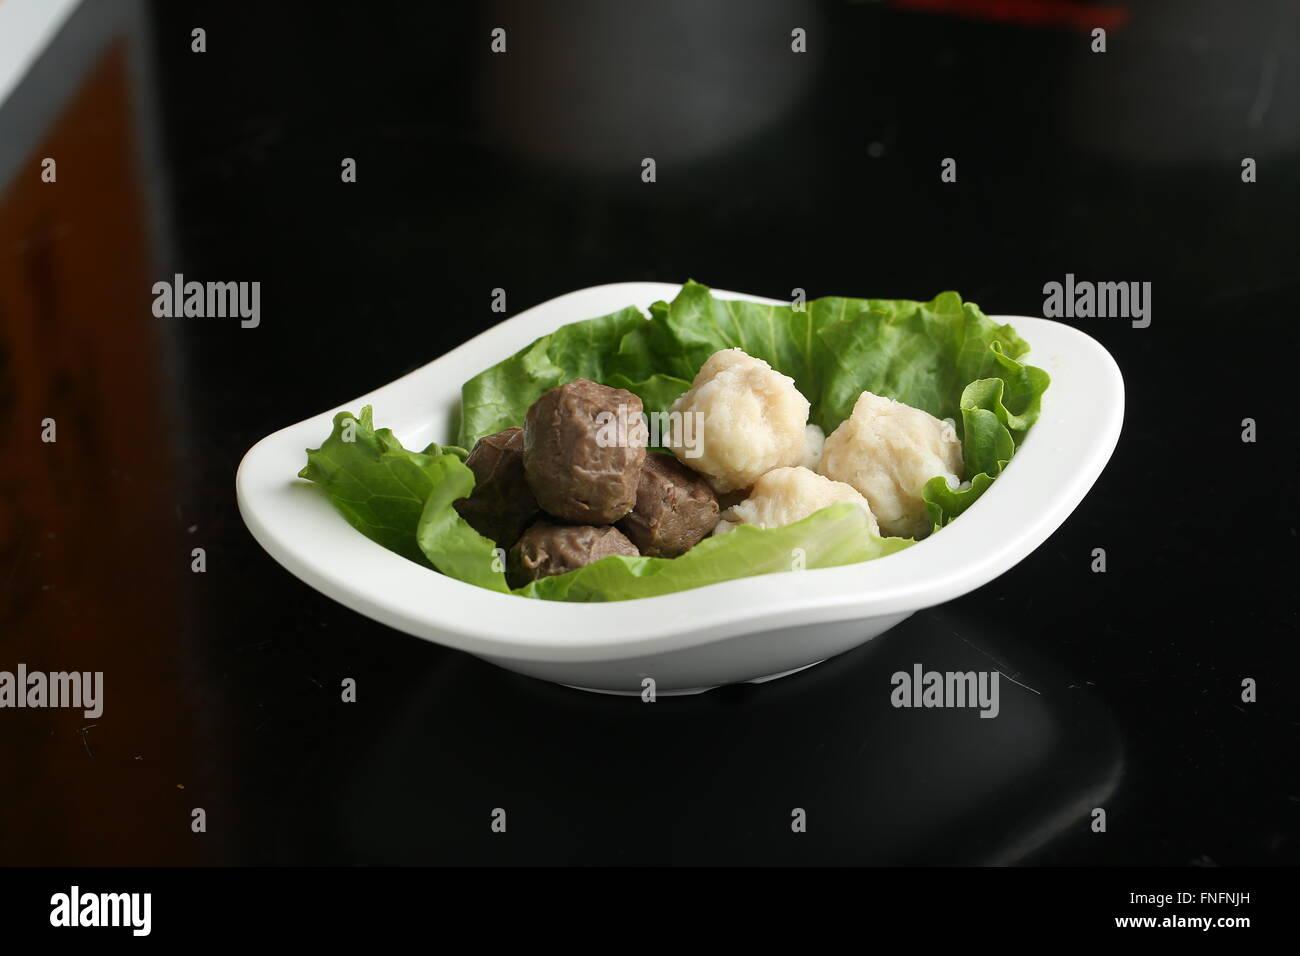 meat balls - Stock Image